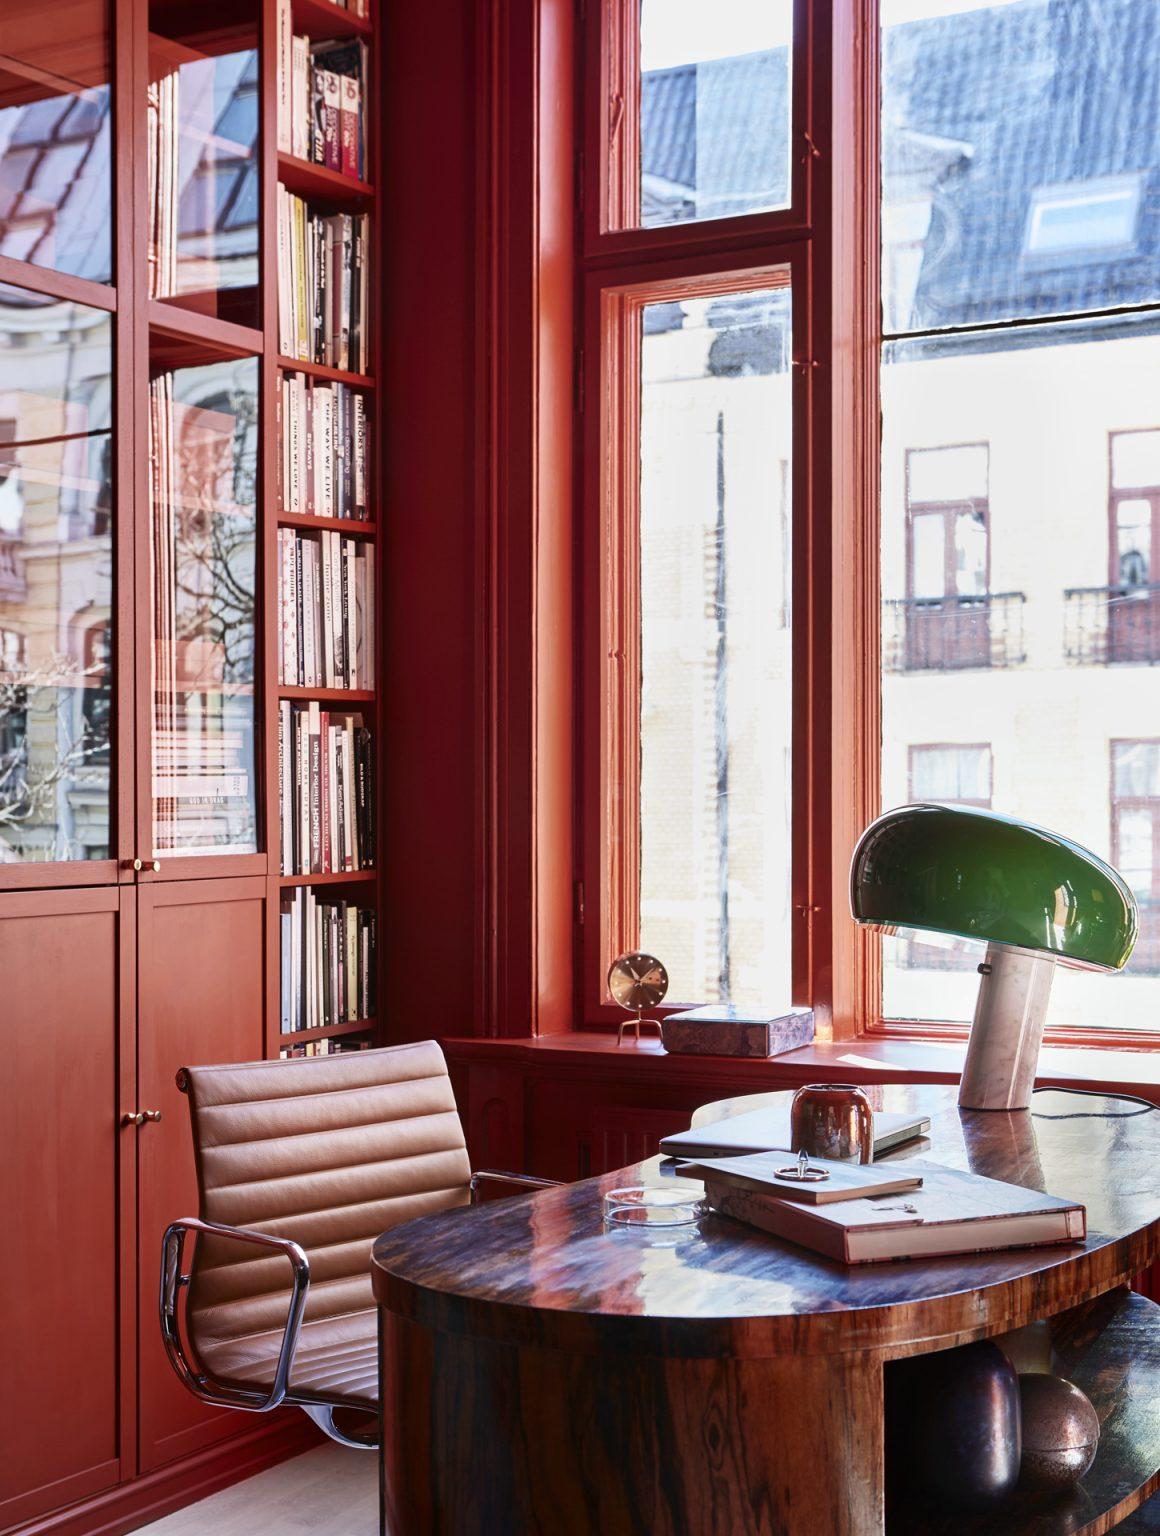 04_pure_original_brownred_walls_windows_bookshelf